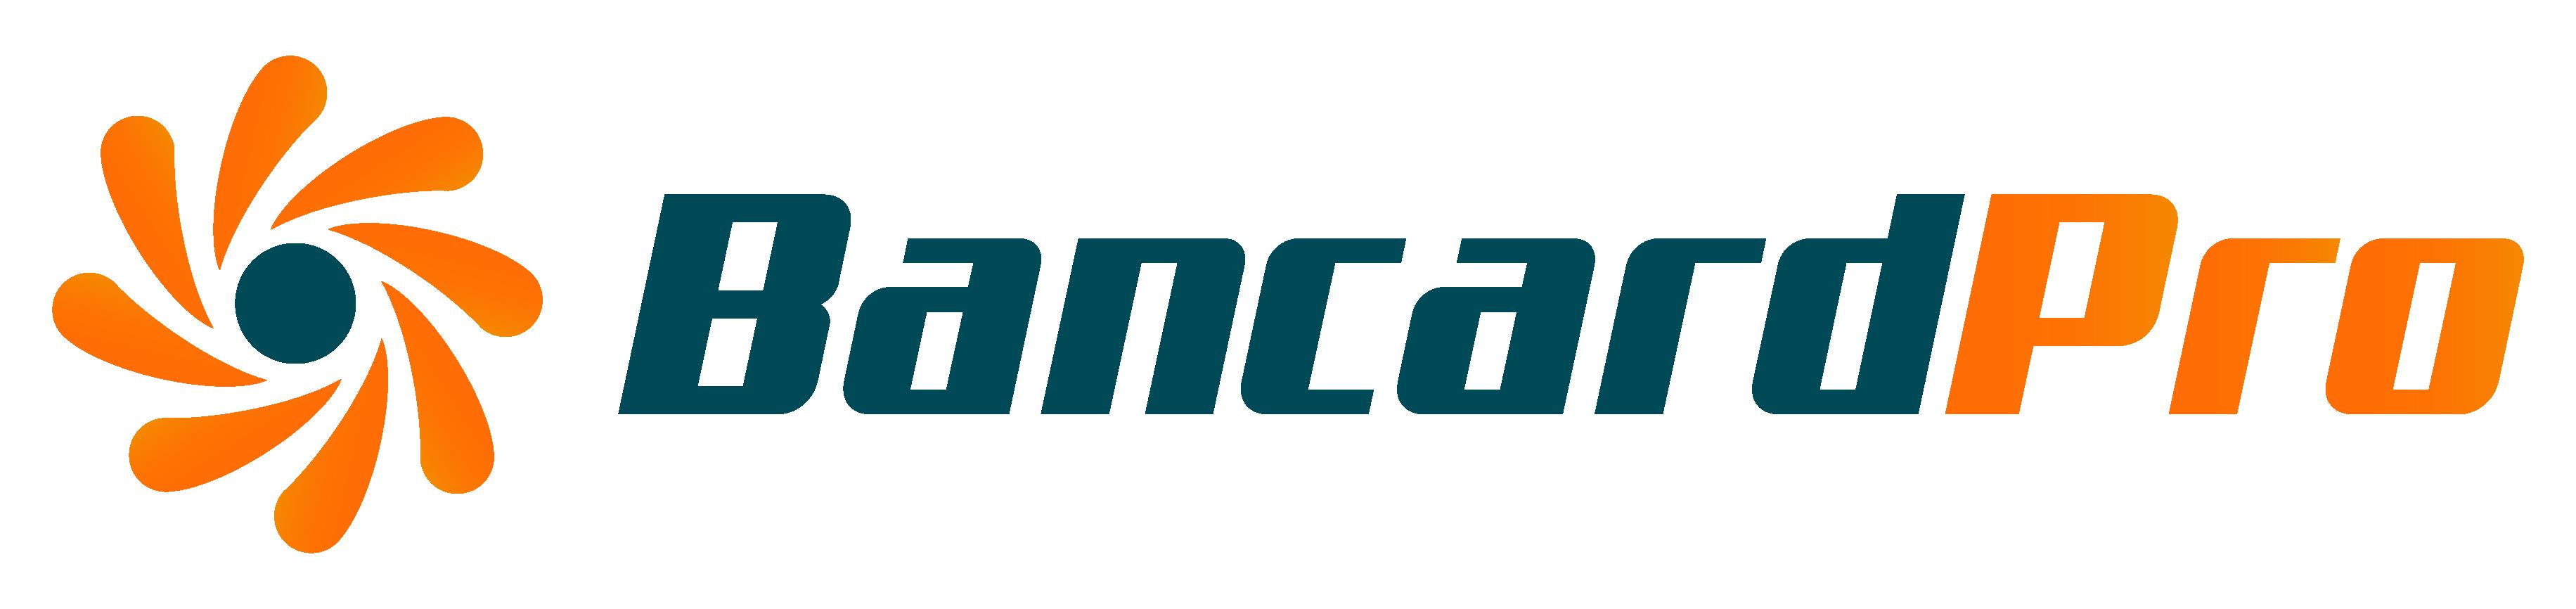 Bancardpro.com